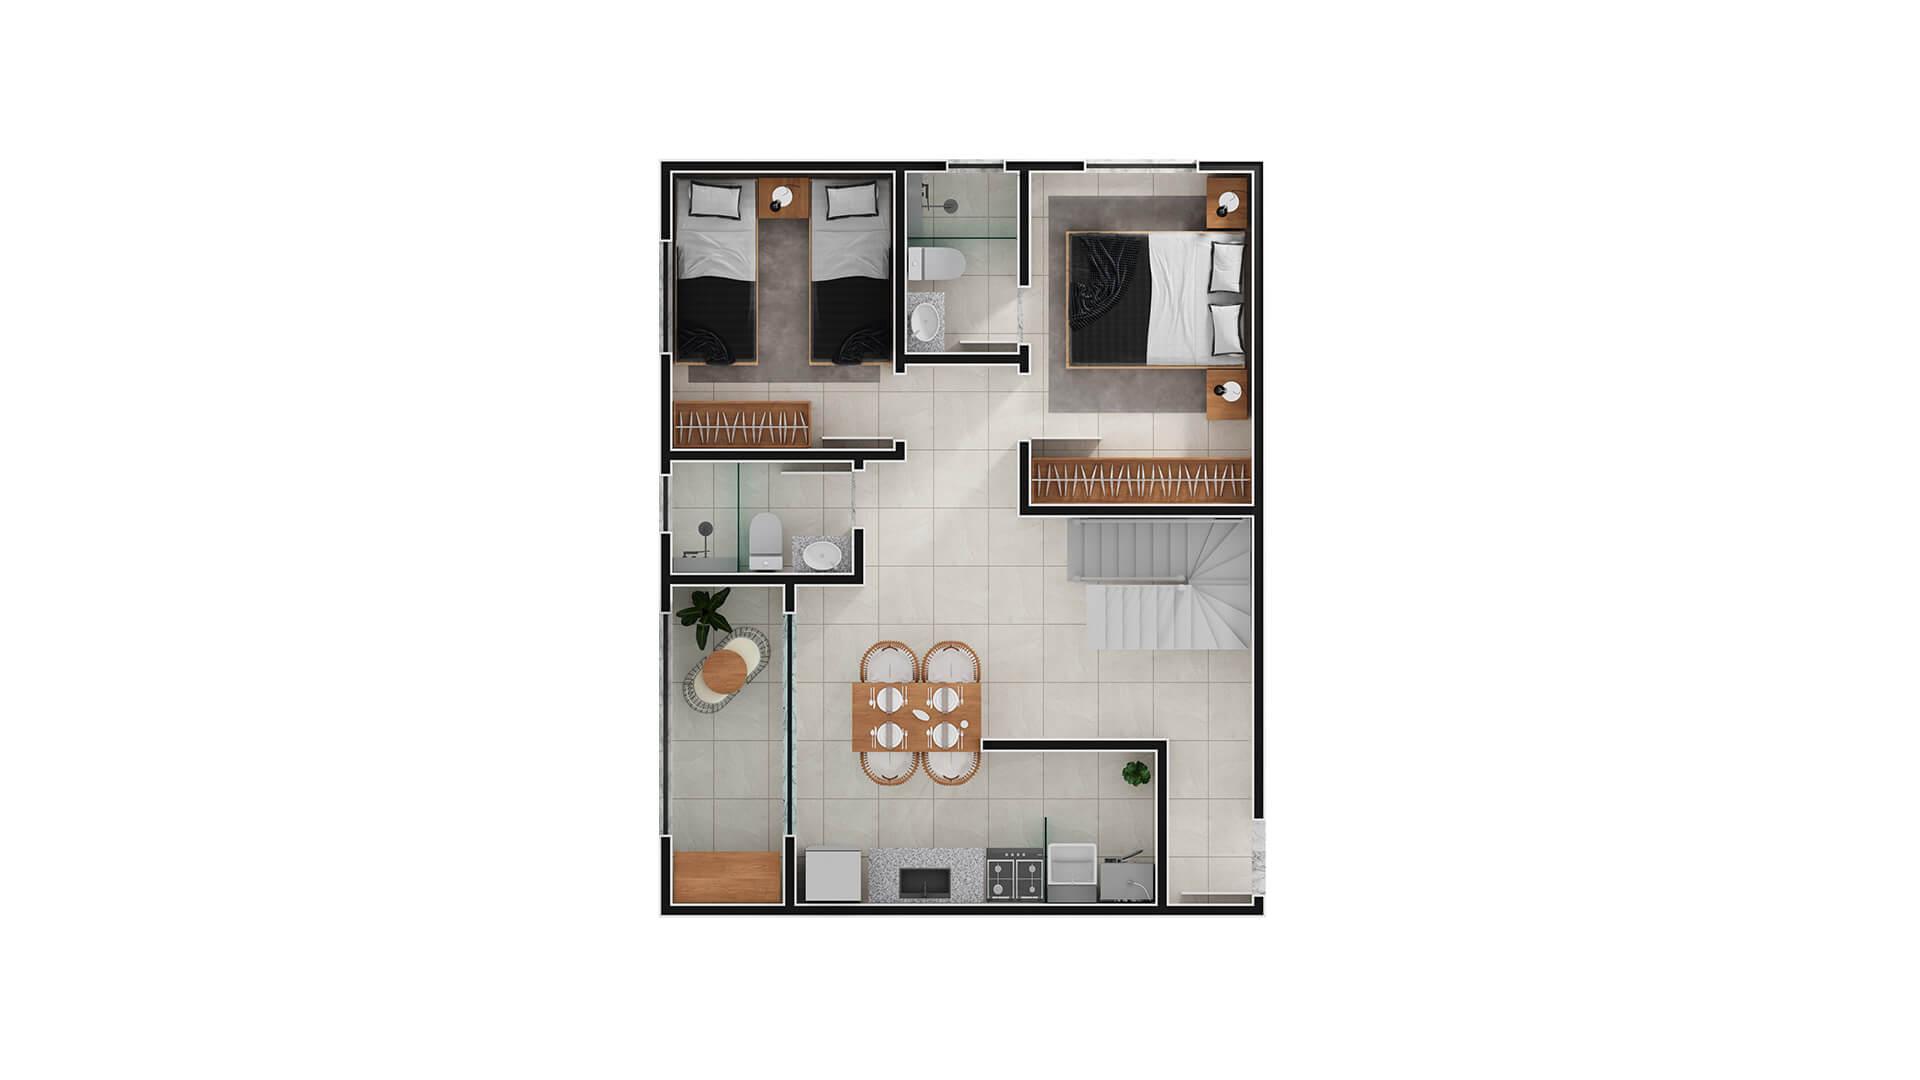 cobertura canto torre 1 - 1º andar - Upside Club